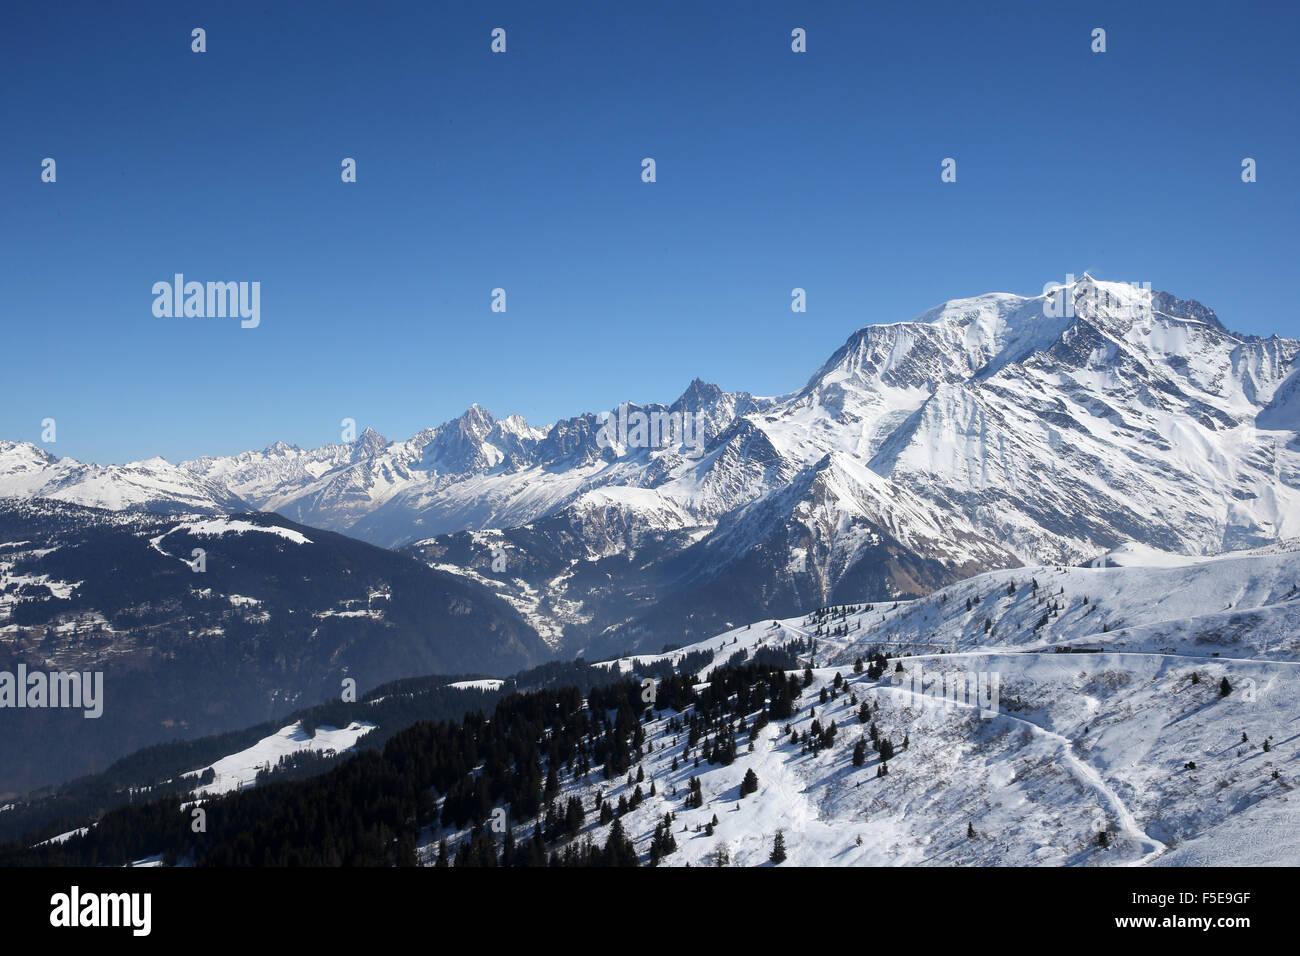 Mont Blanc in Saint-Gervais les Bains, Haute-Savoie, French Alps, France, Europe - Stock Image